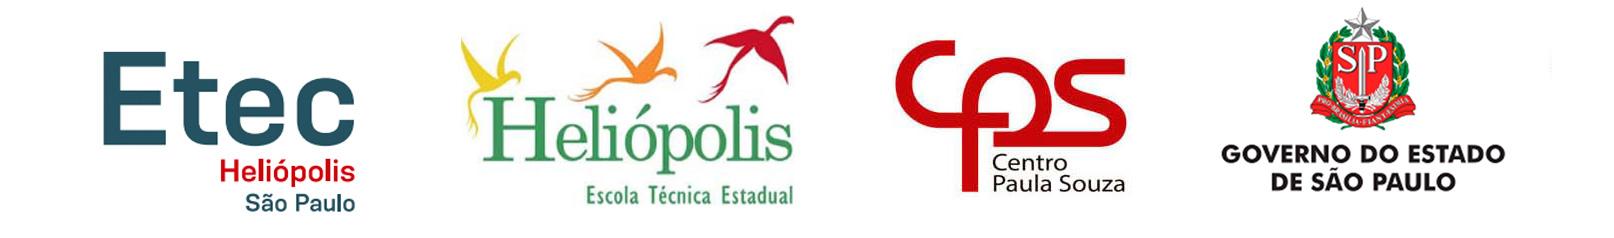 centro paula souza - etec heliopolis